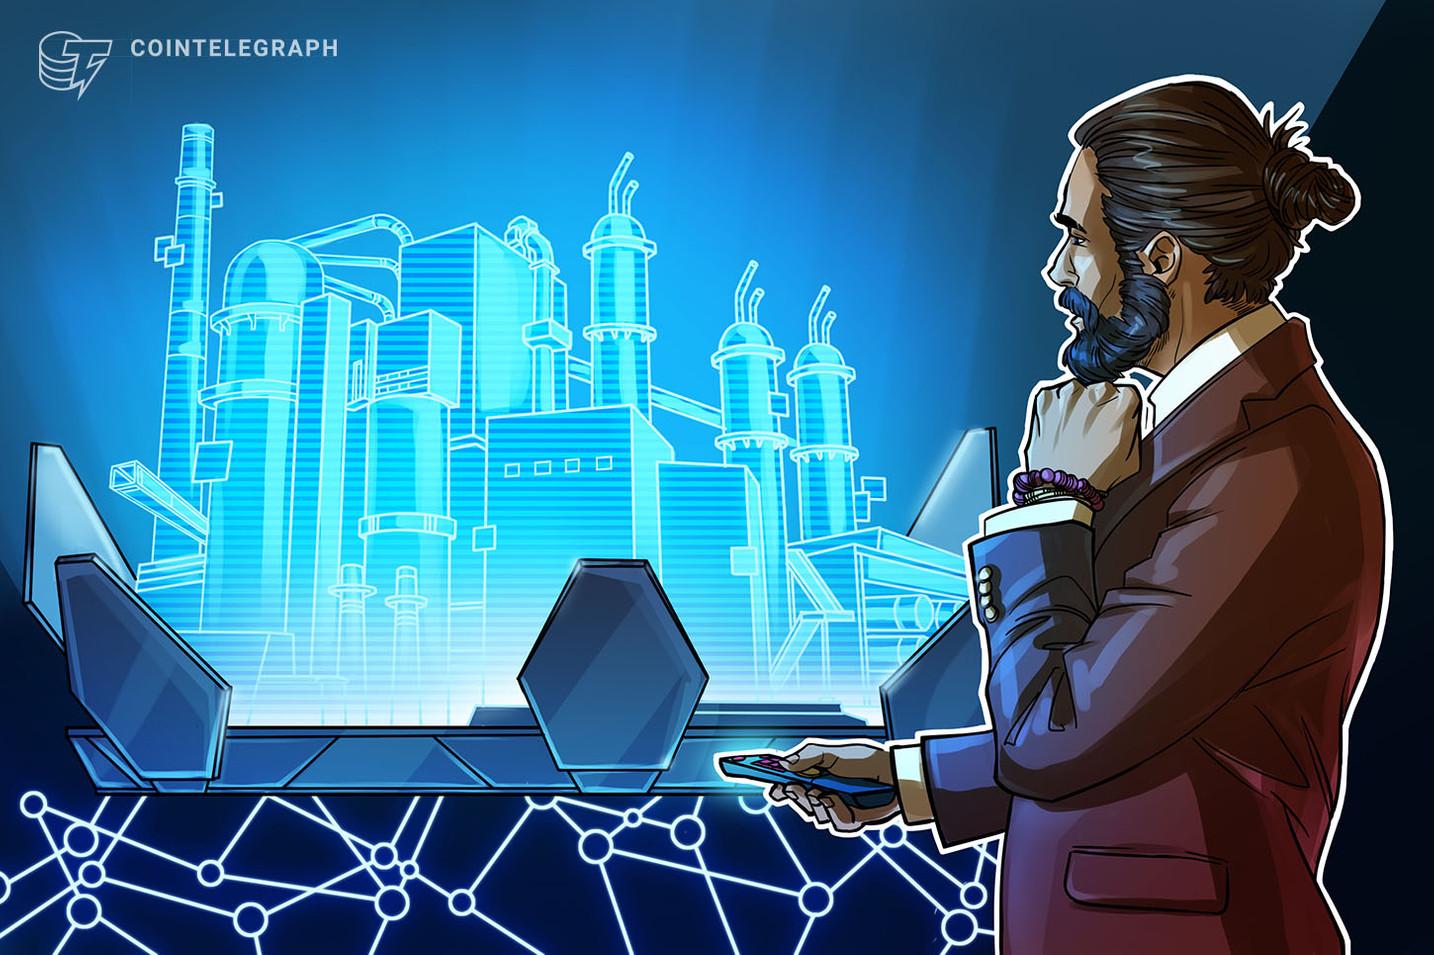 Telos launches new gig economy platform on the blockchain